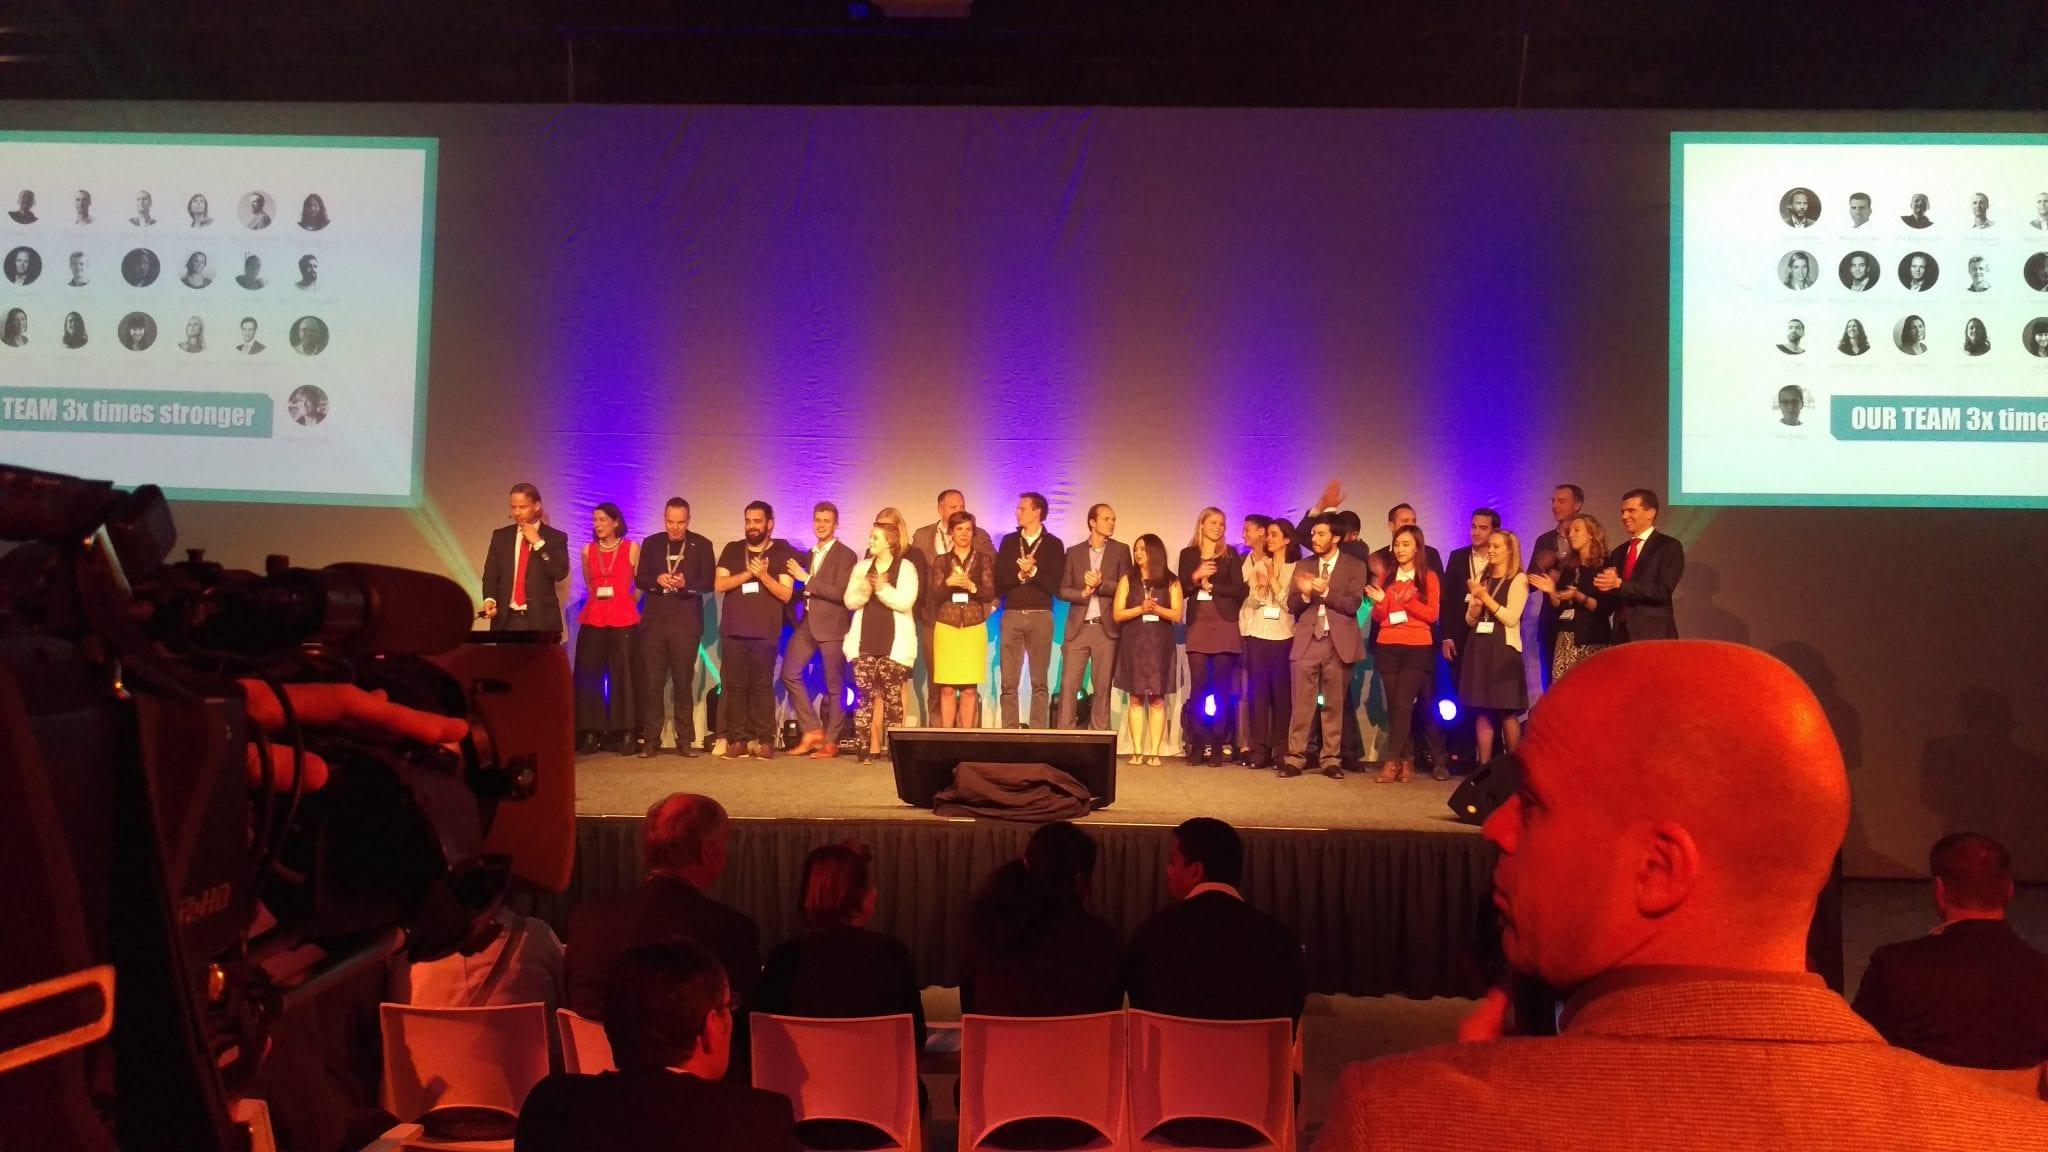 'Coole' hardware startups van Startupbootcamp HightechXL willen 8 miljoen ophalen